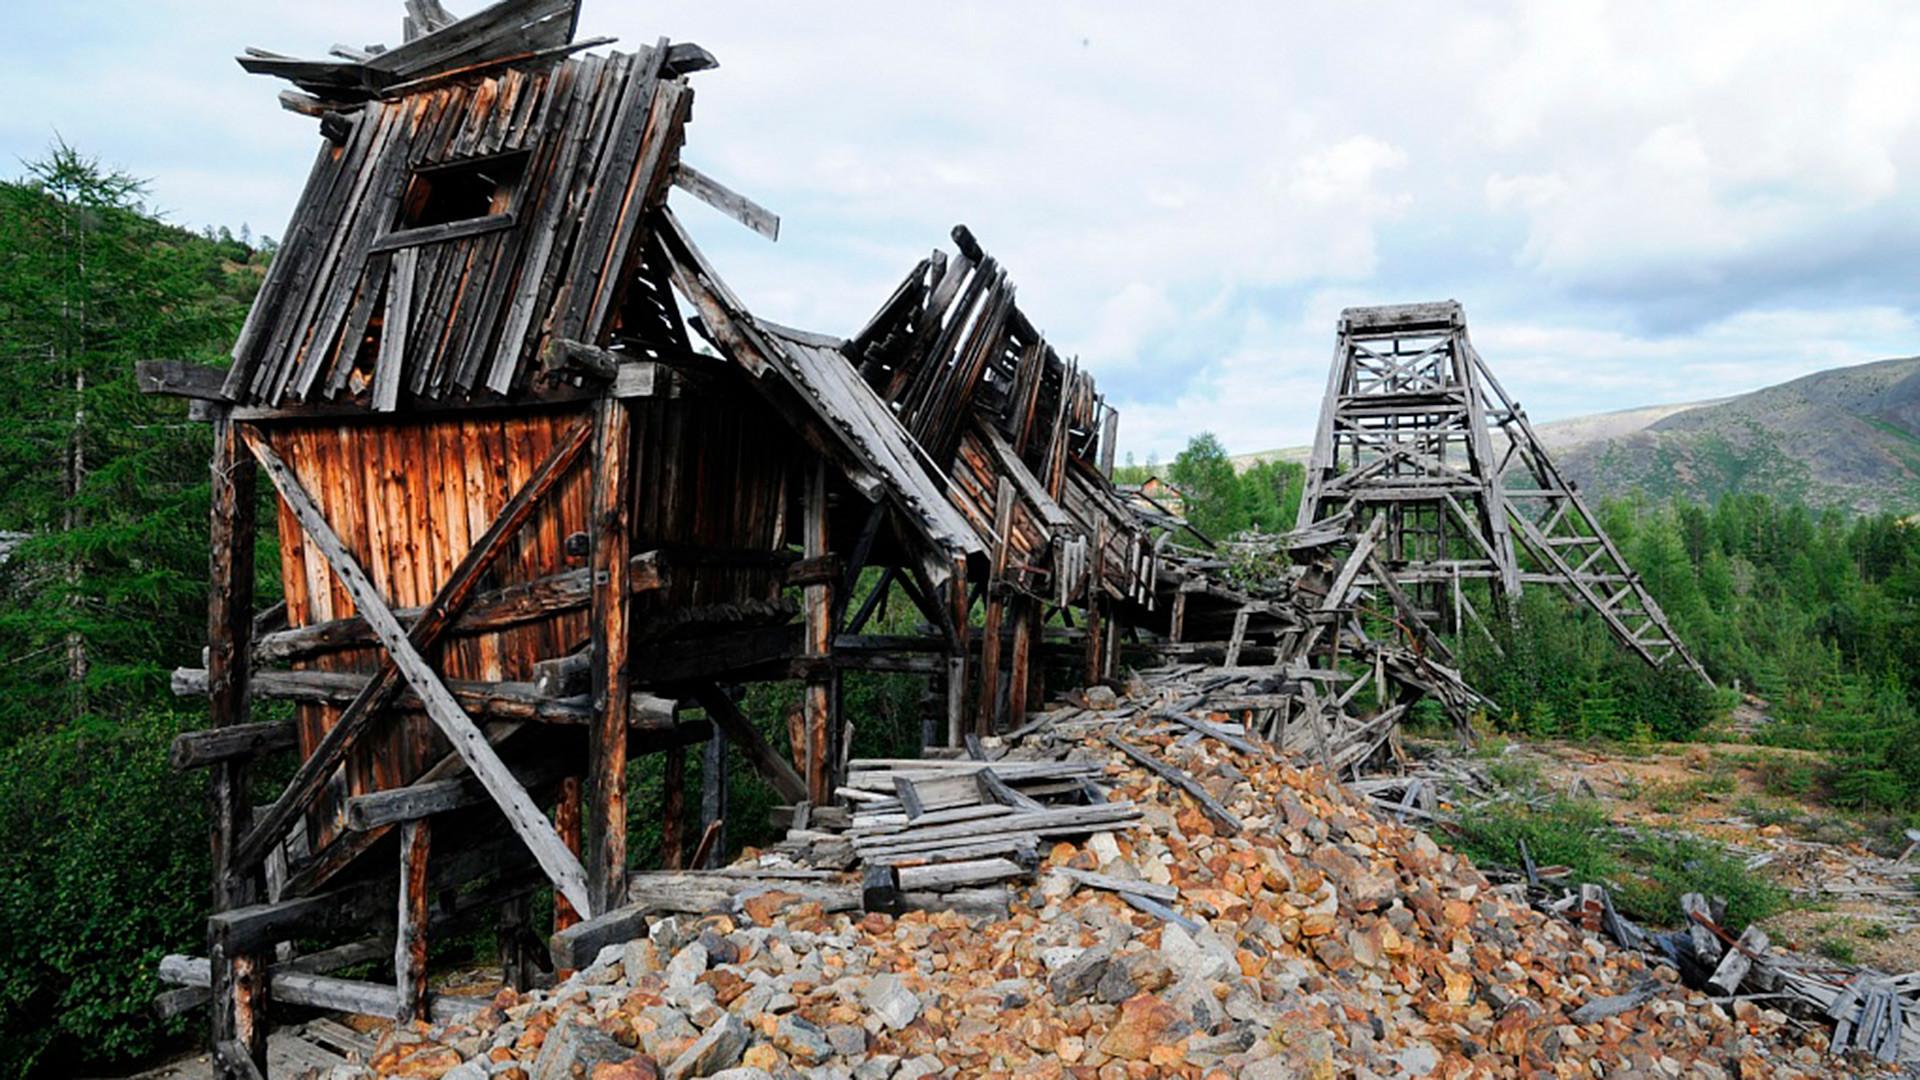 Днепровски лагер и рудник в Магаданска област, 2014 г.